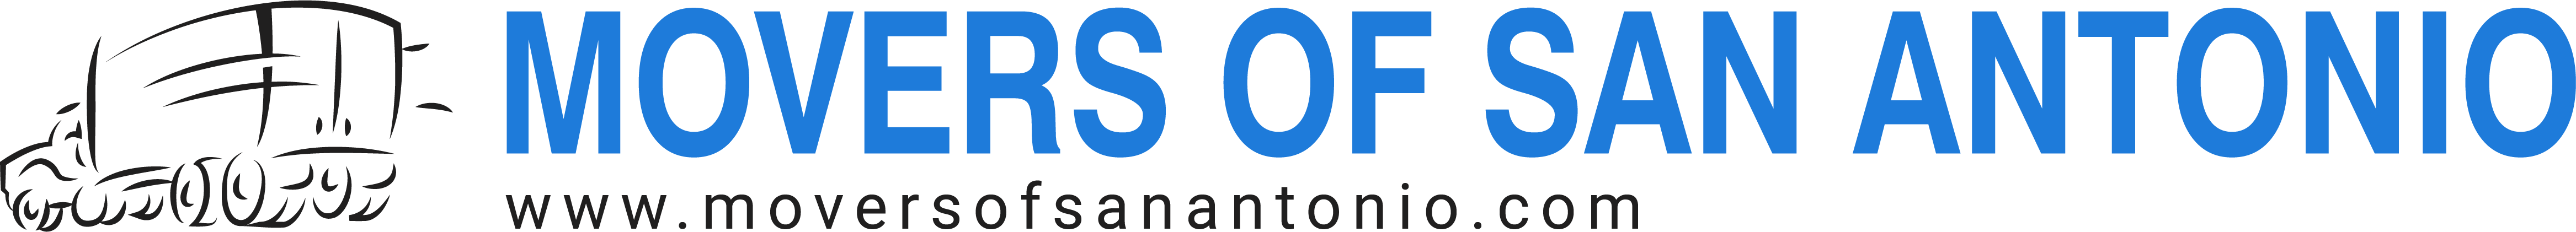 Movers of San Antonio Logo